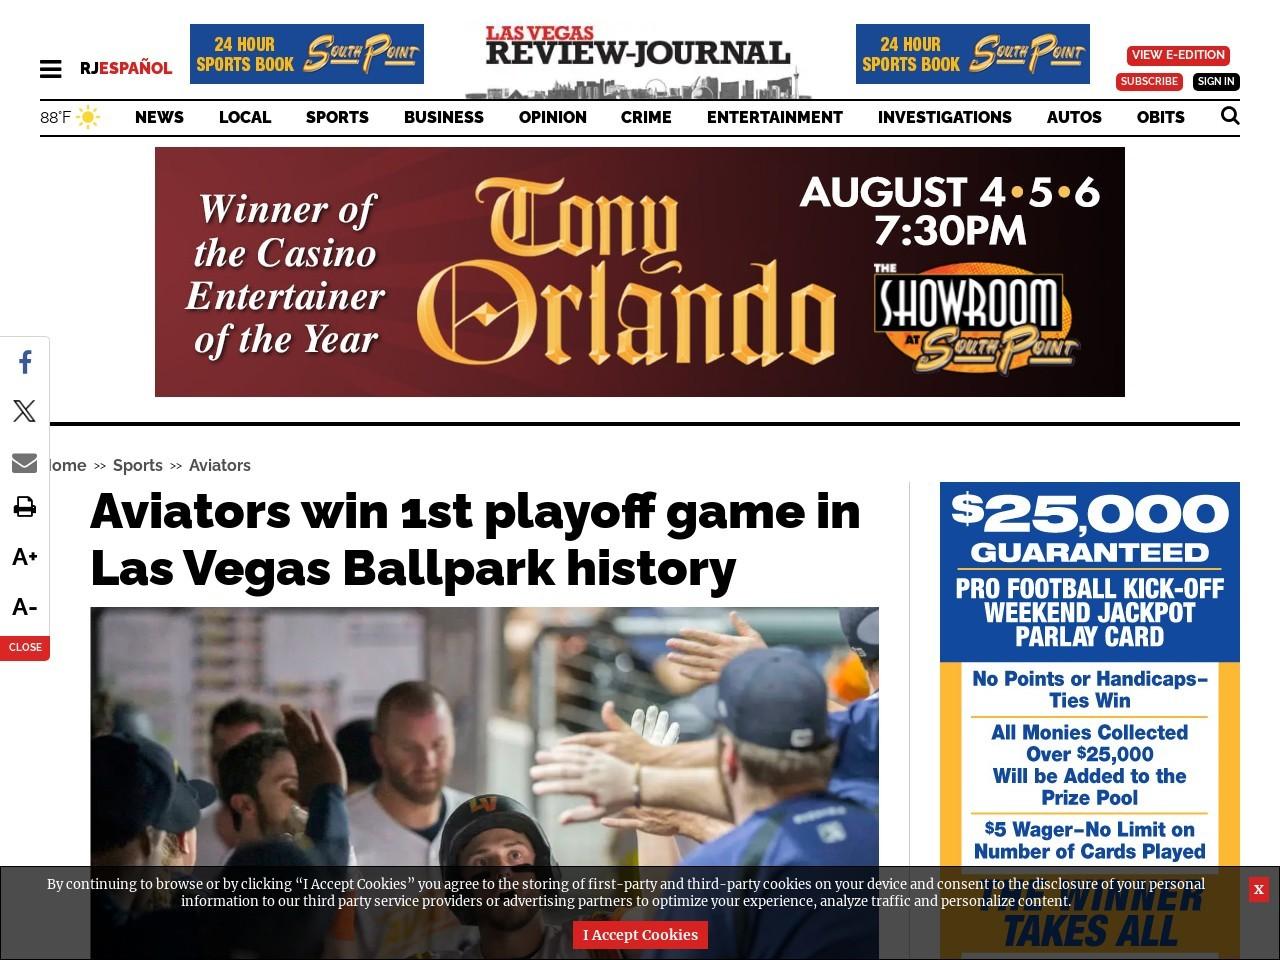 Aviators win 1st playoff game in Las Vegas Ballpark history